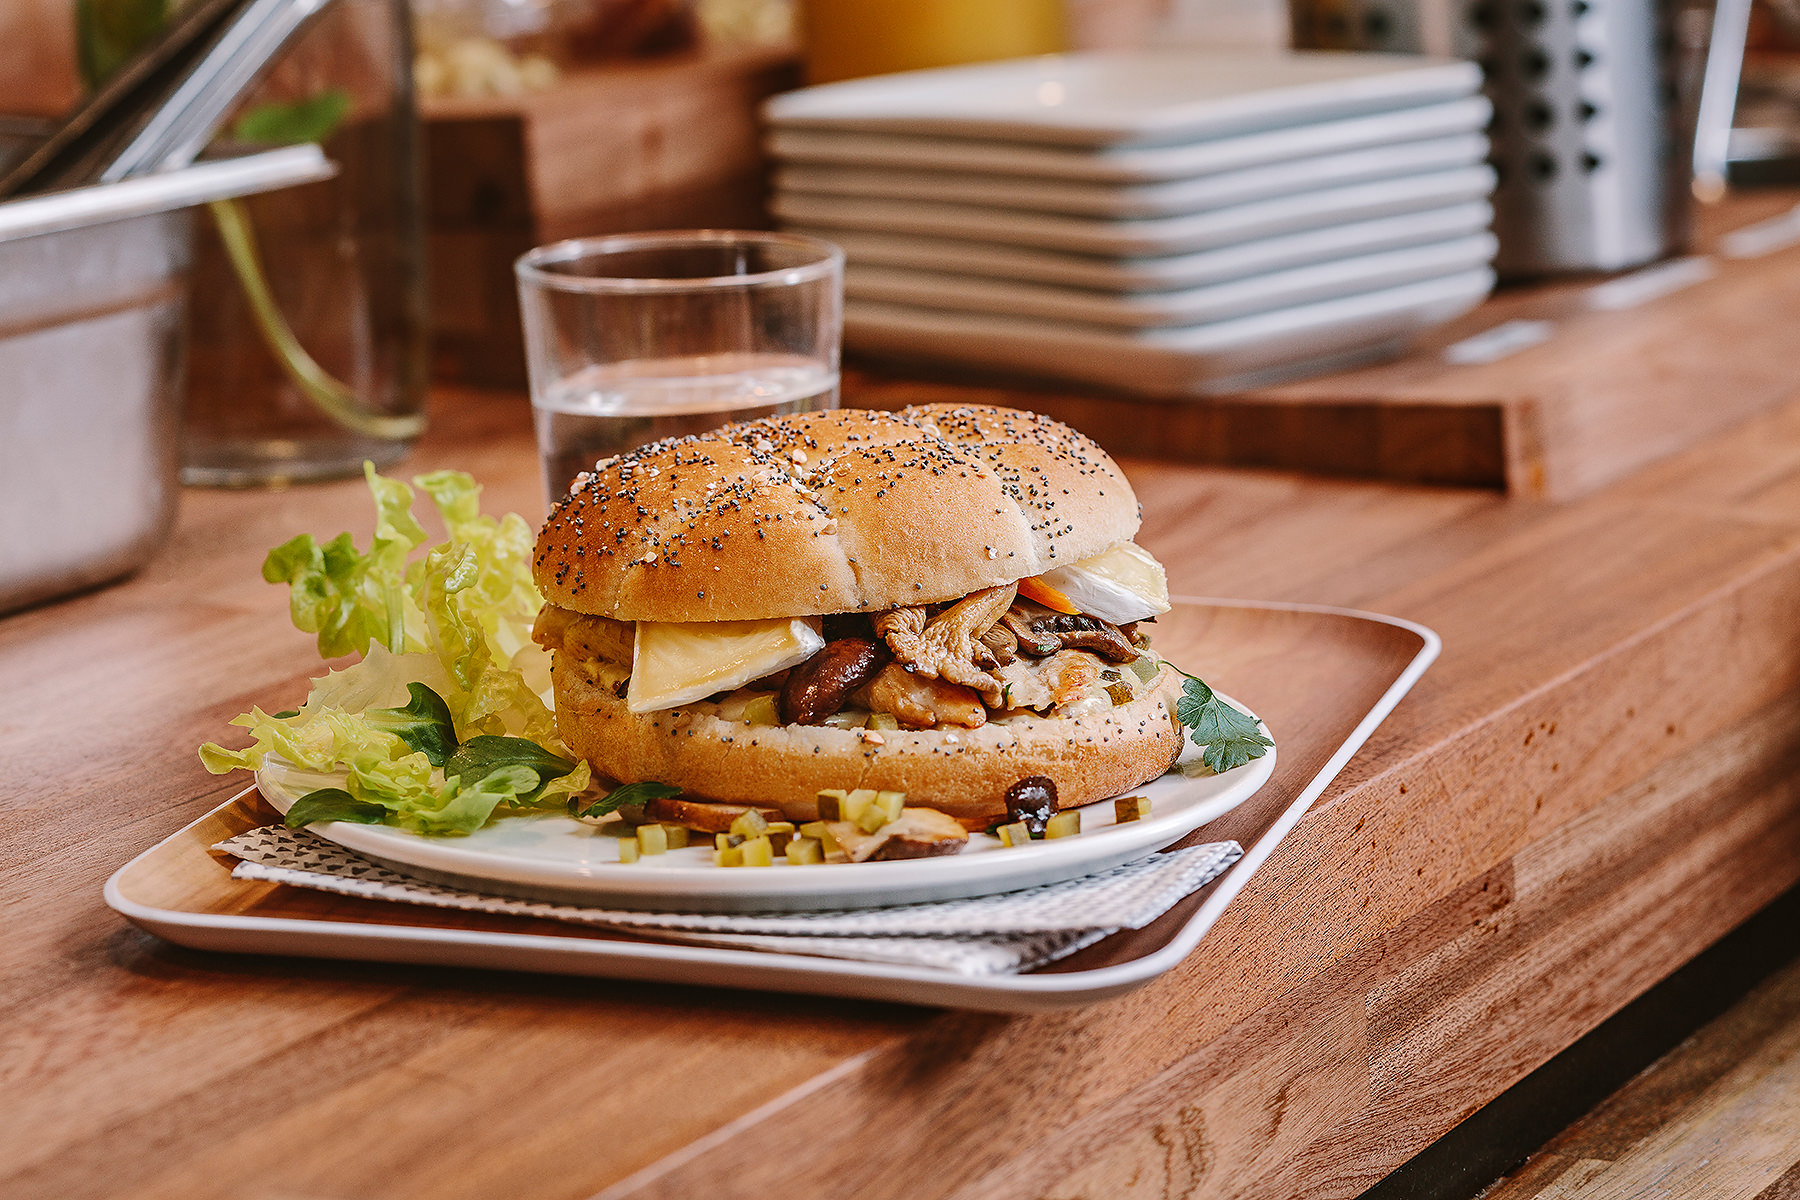 Harrys-burger-027